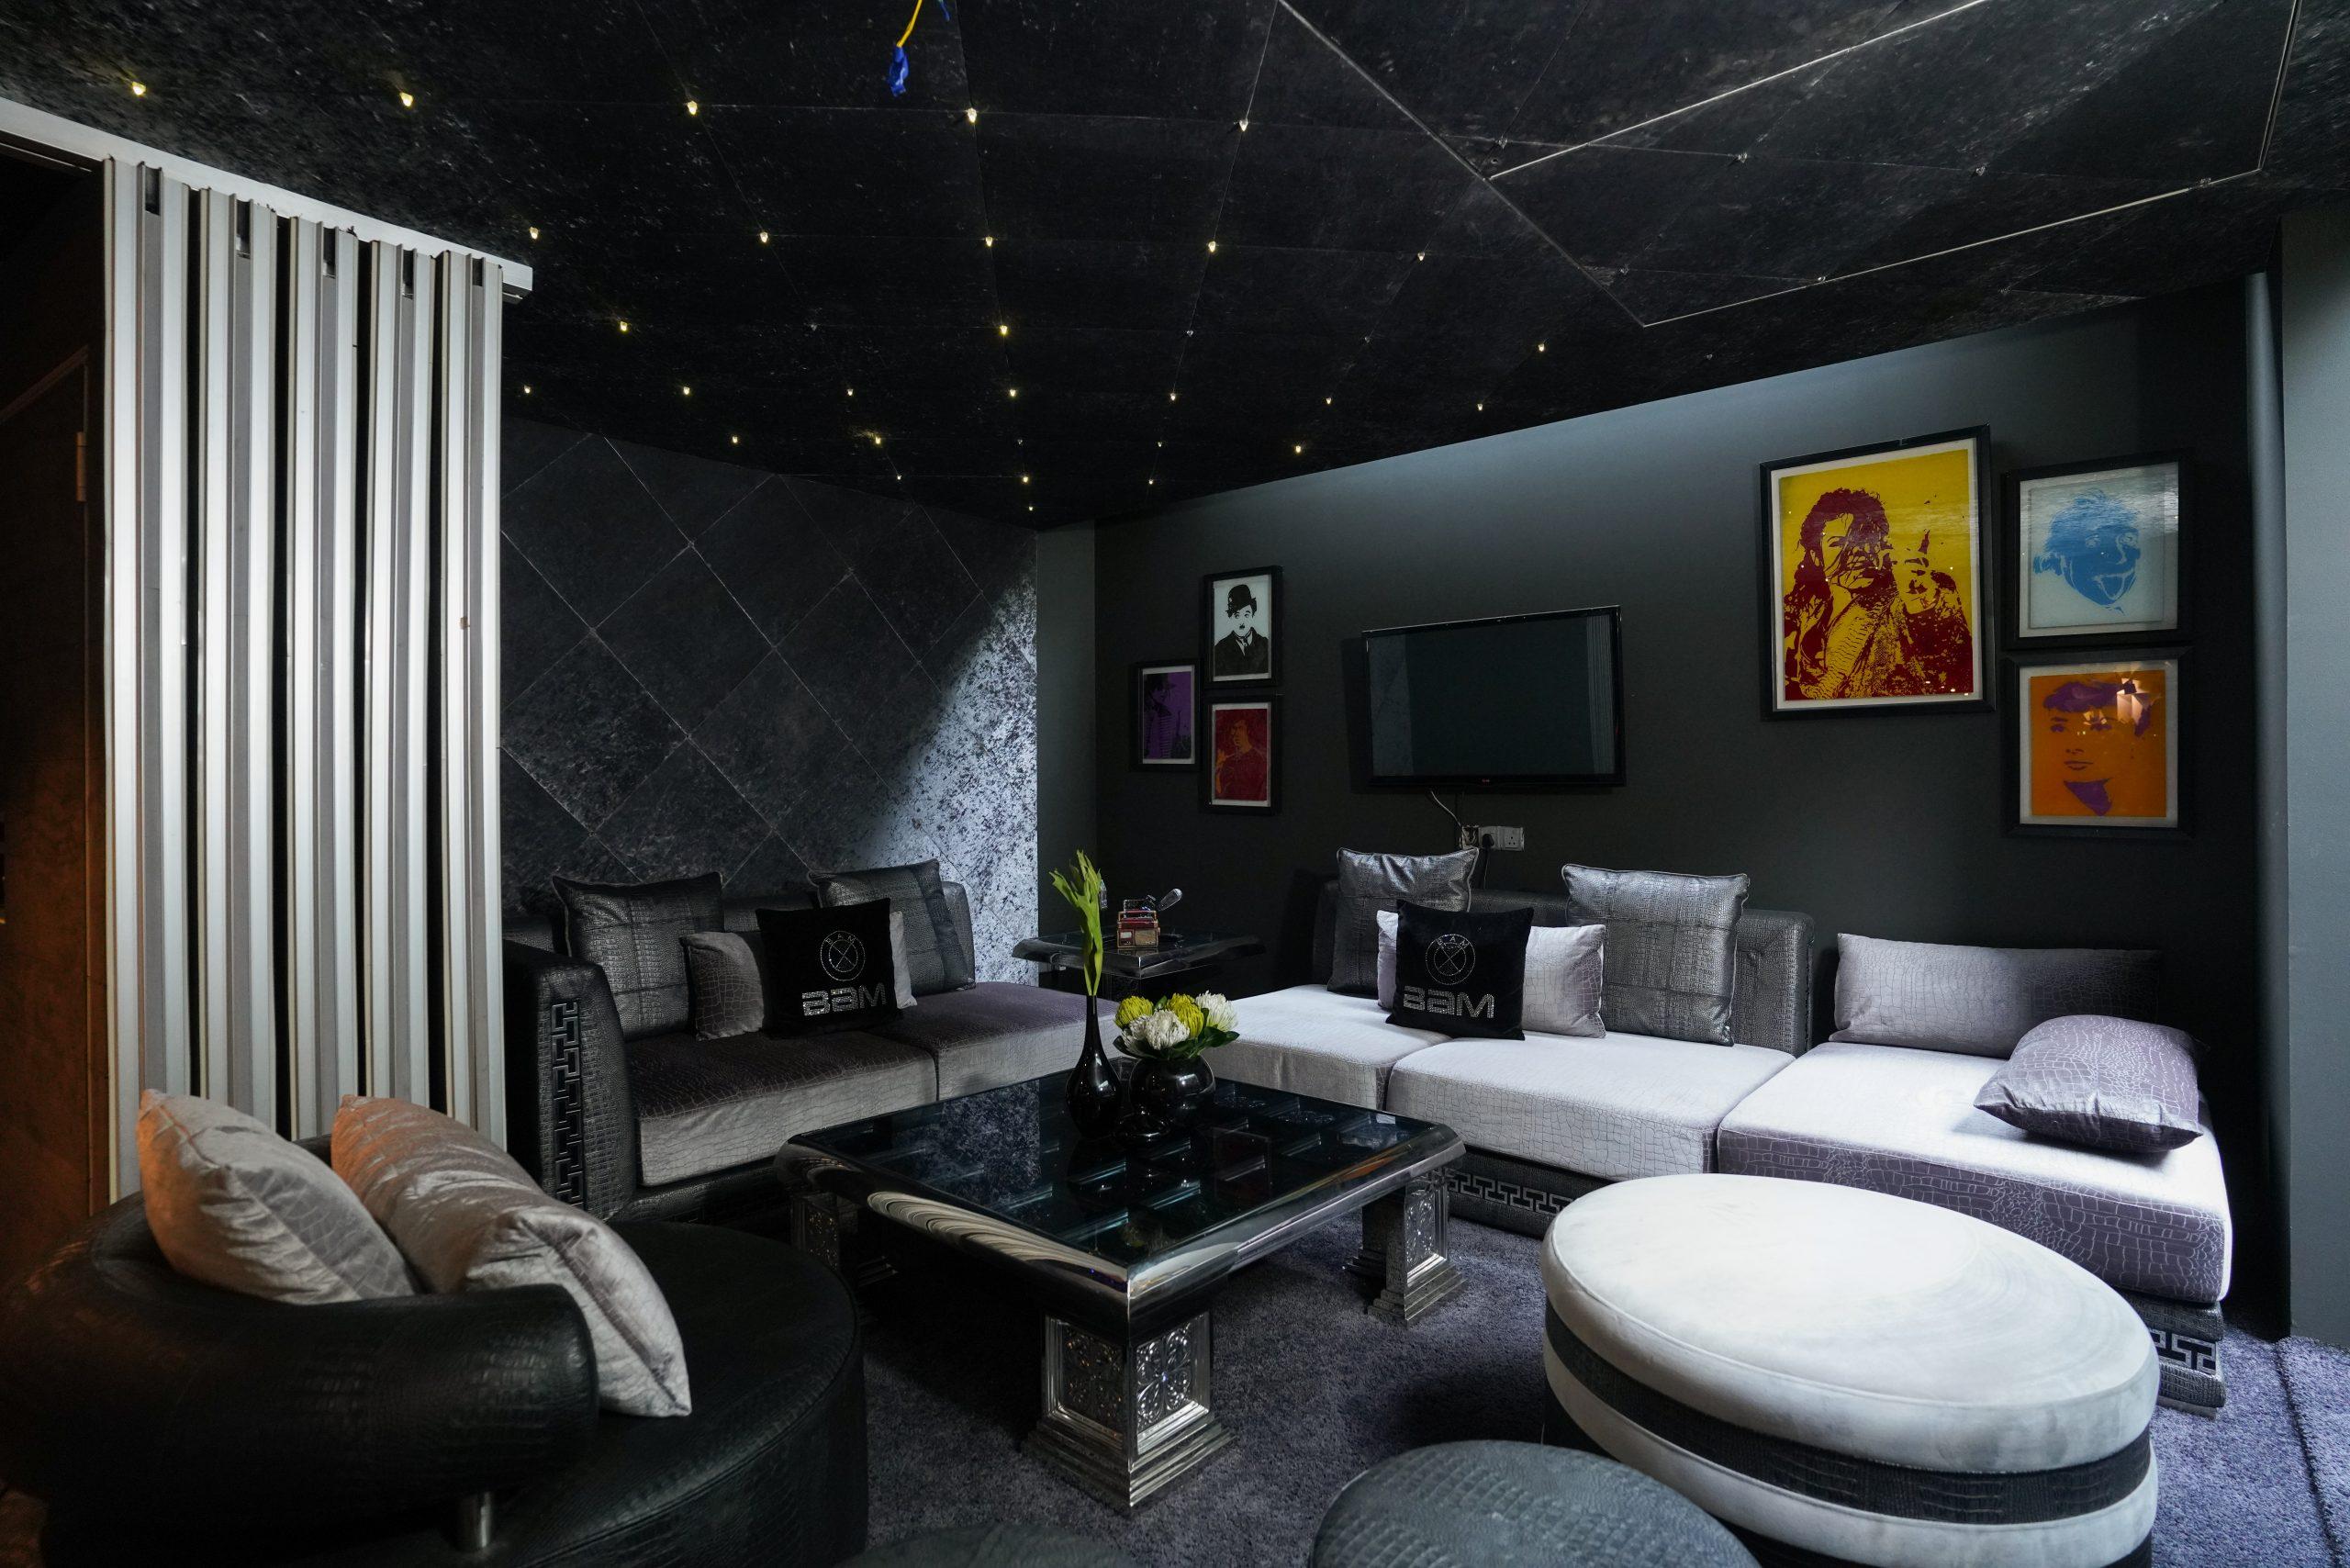 Interior decoration of a room